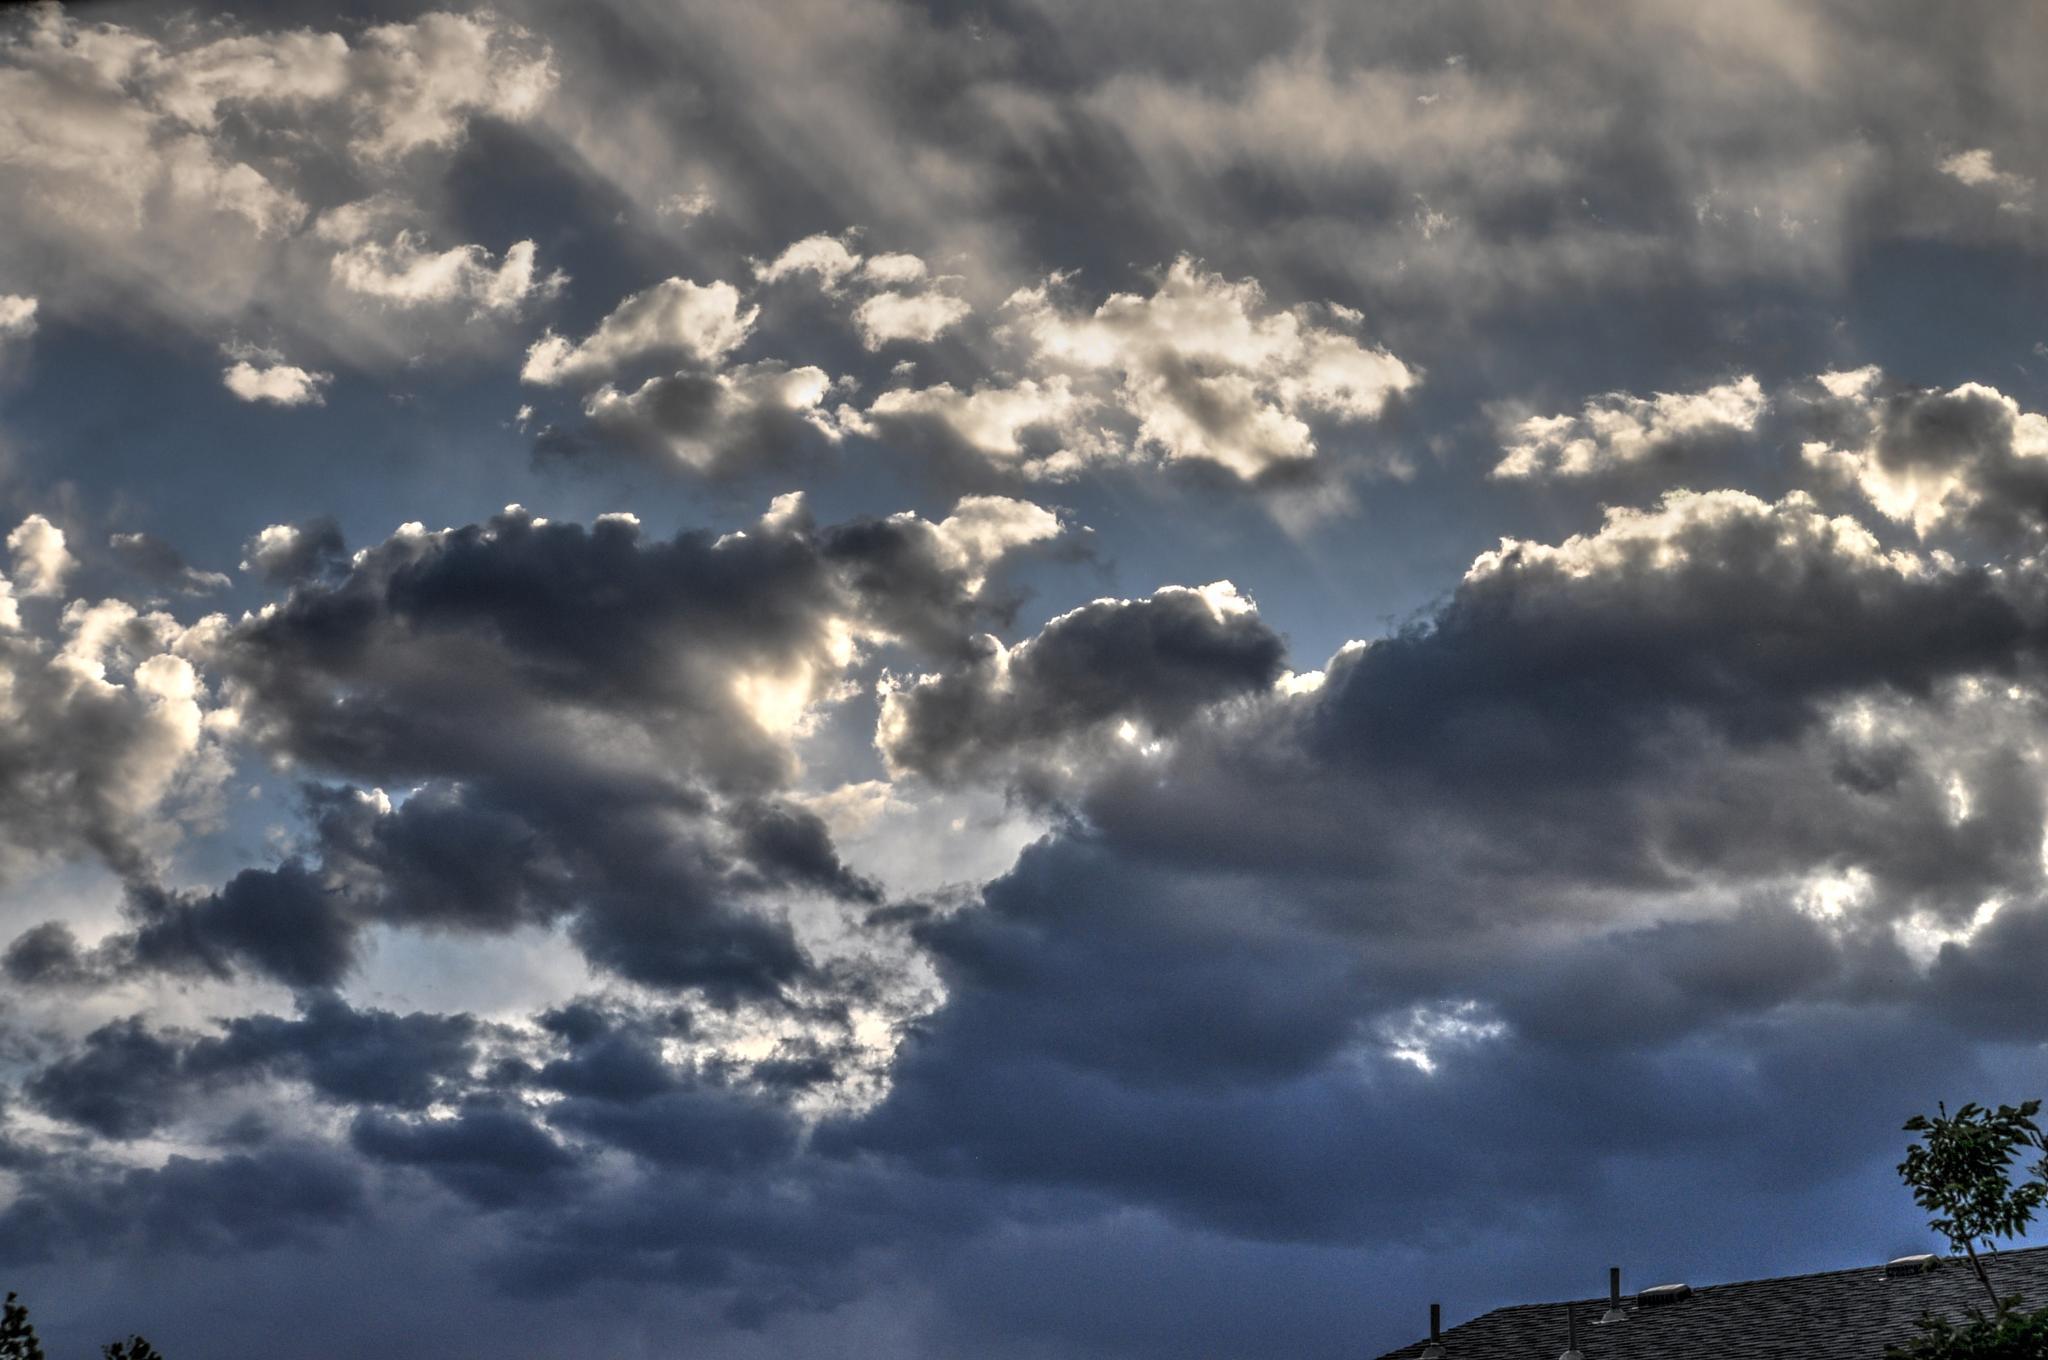 Cloud's by Jaime Cantu